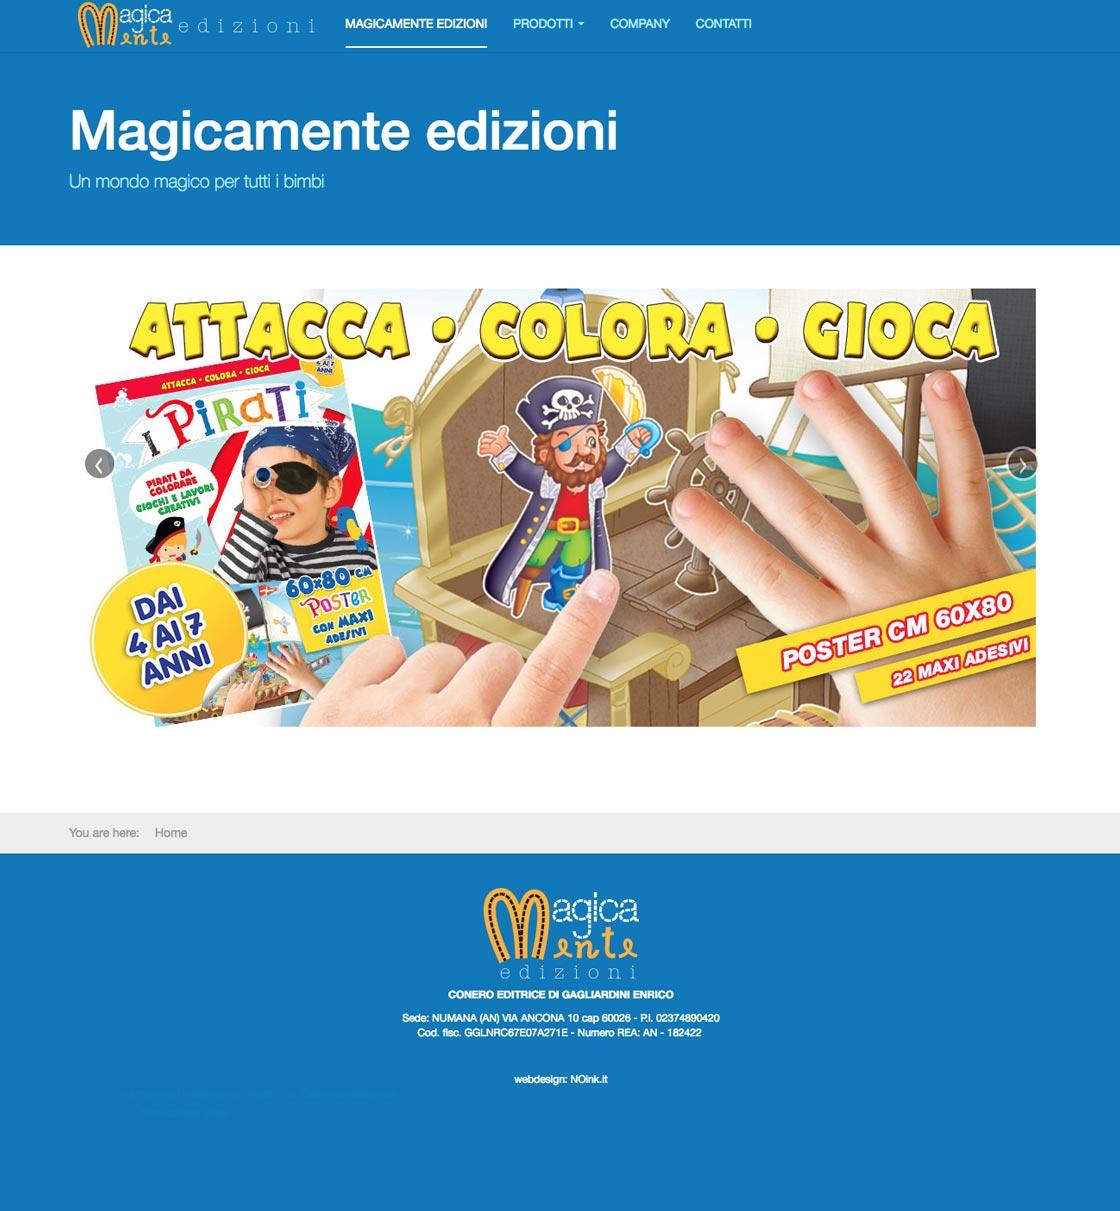 Magicamentedizioni-pagina-home-px1120